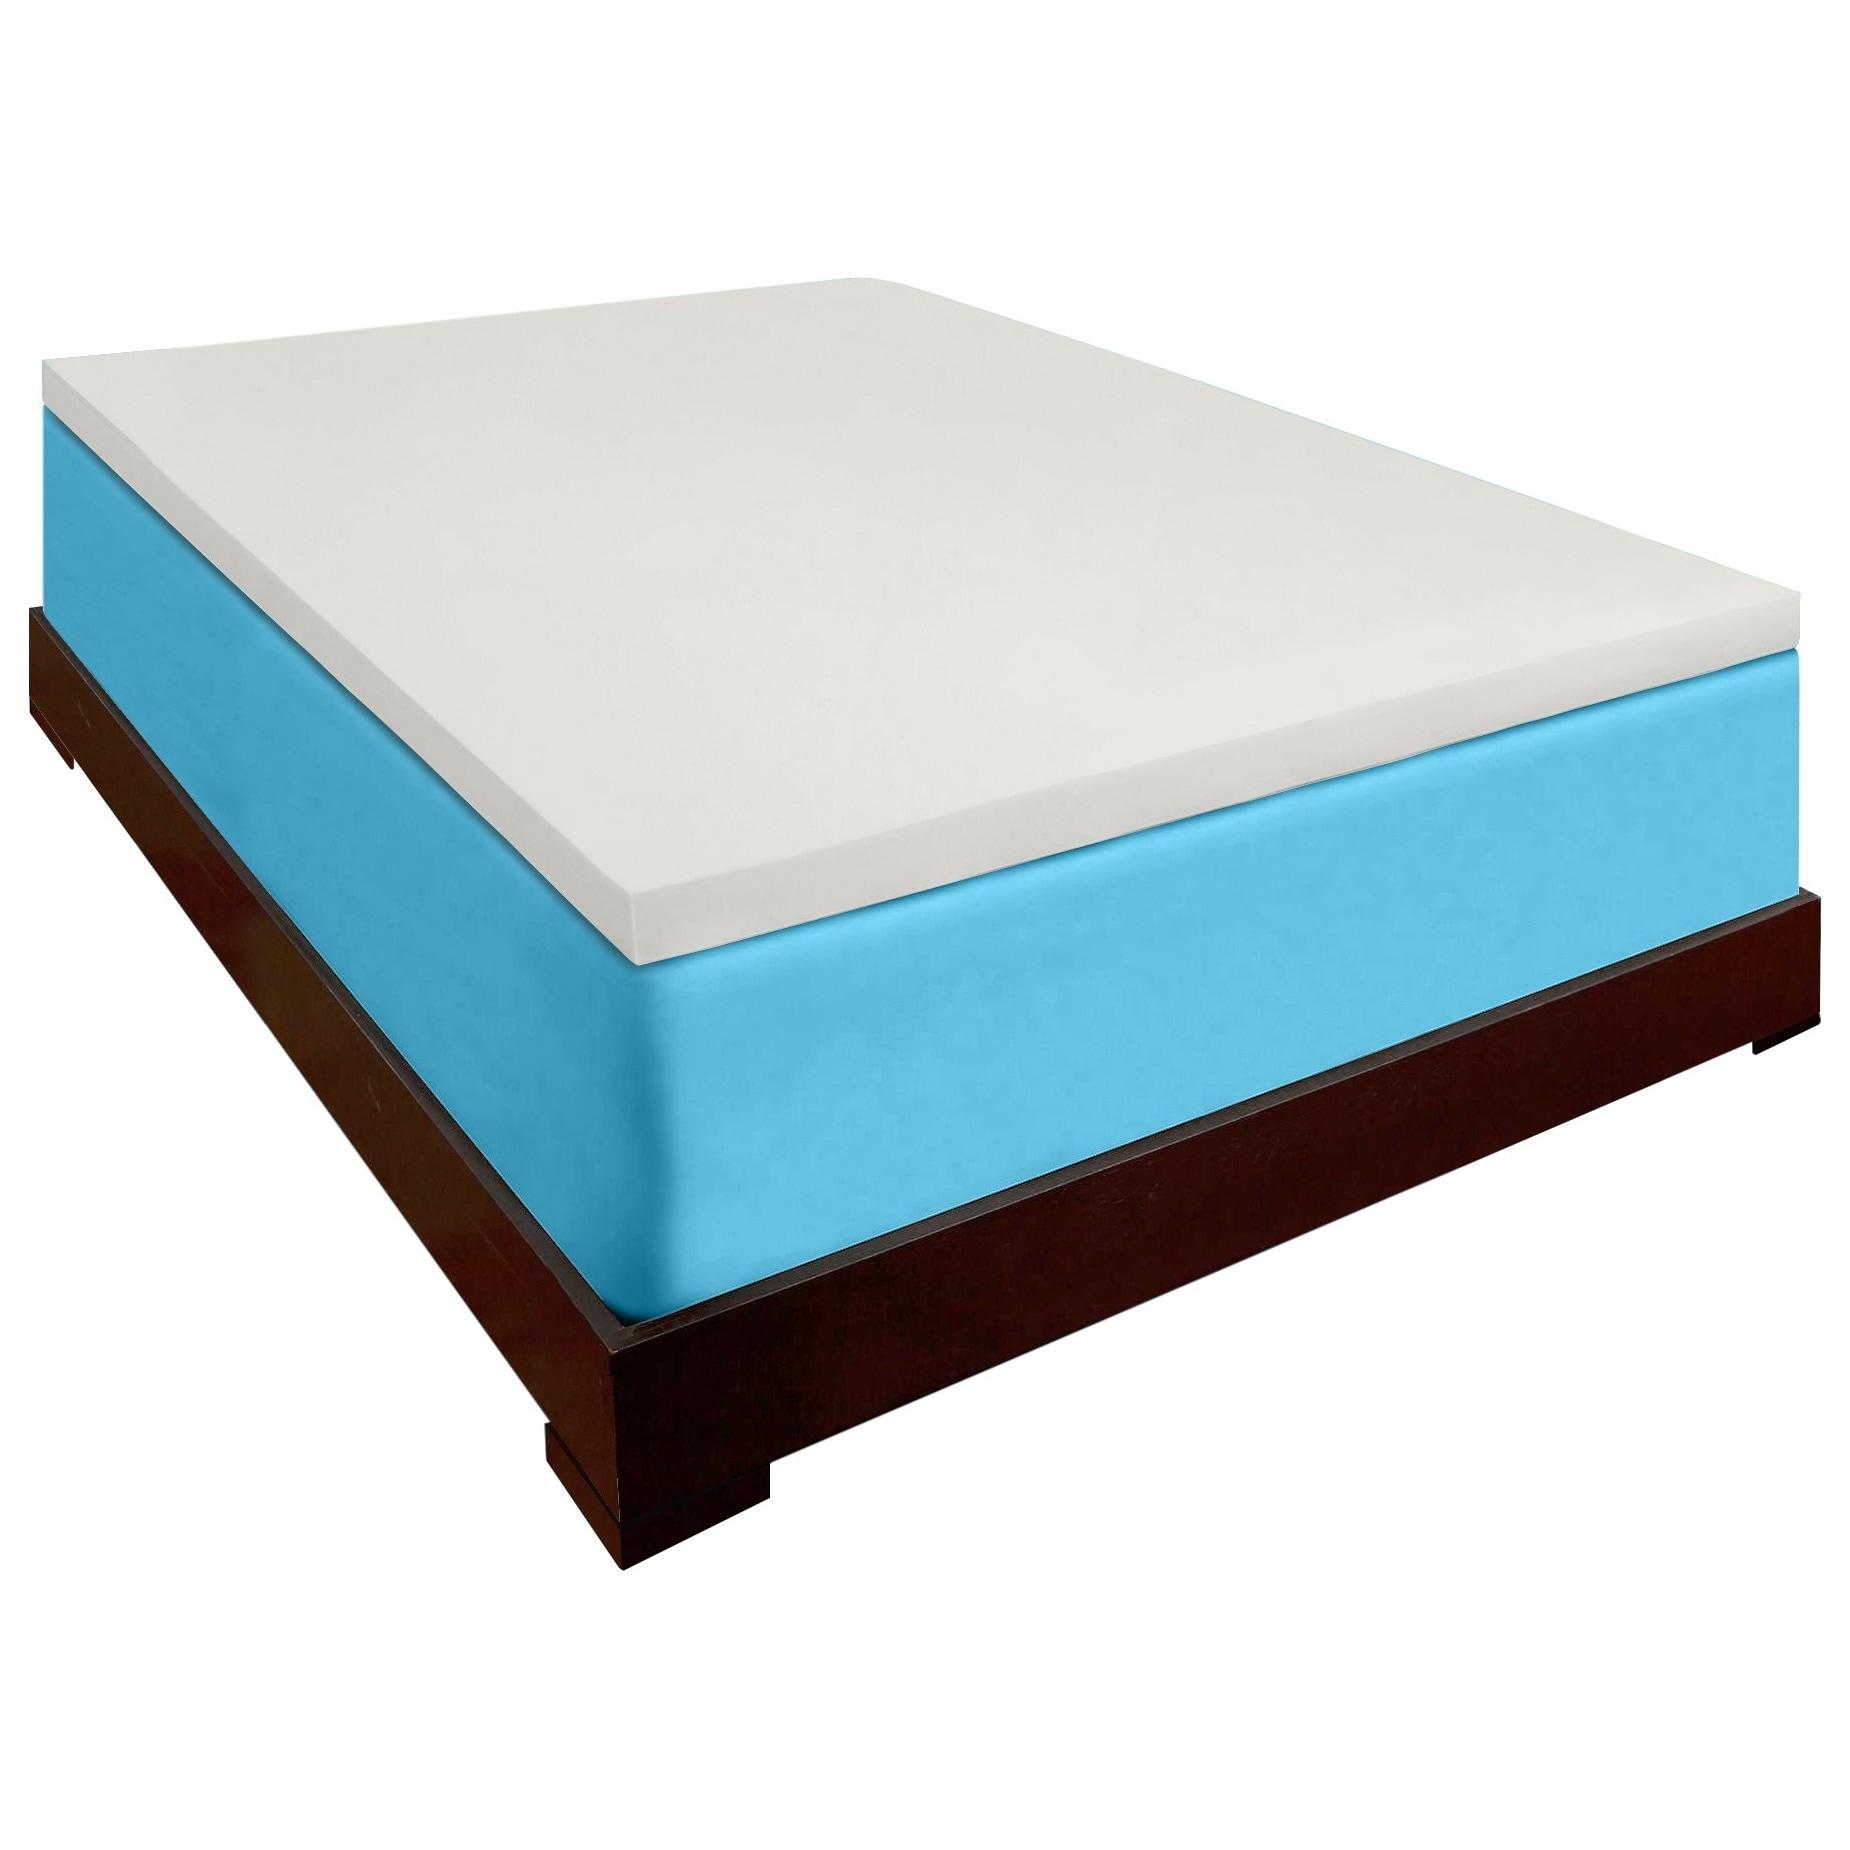 Shop Dreamdna 4 Inch 4 Pound Density Memory Foam Mattress Topper